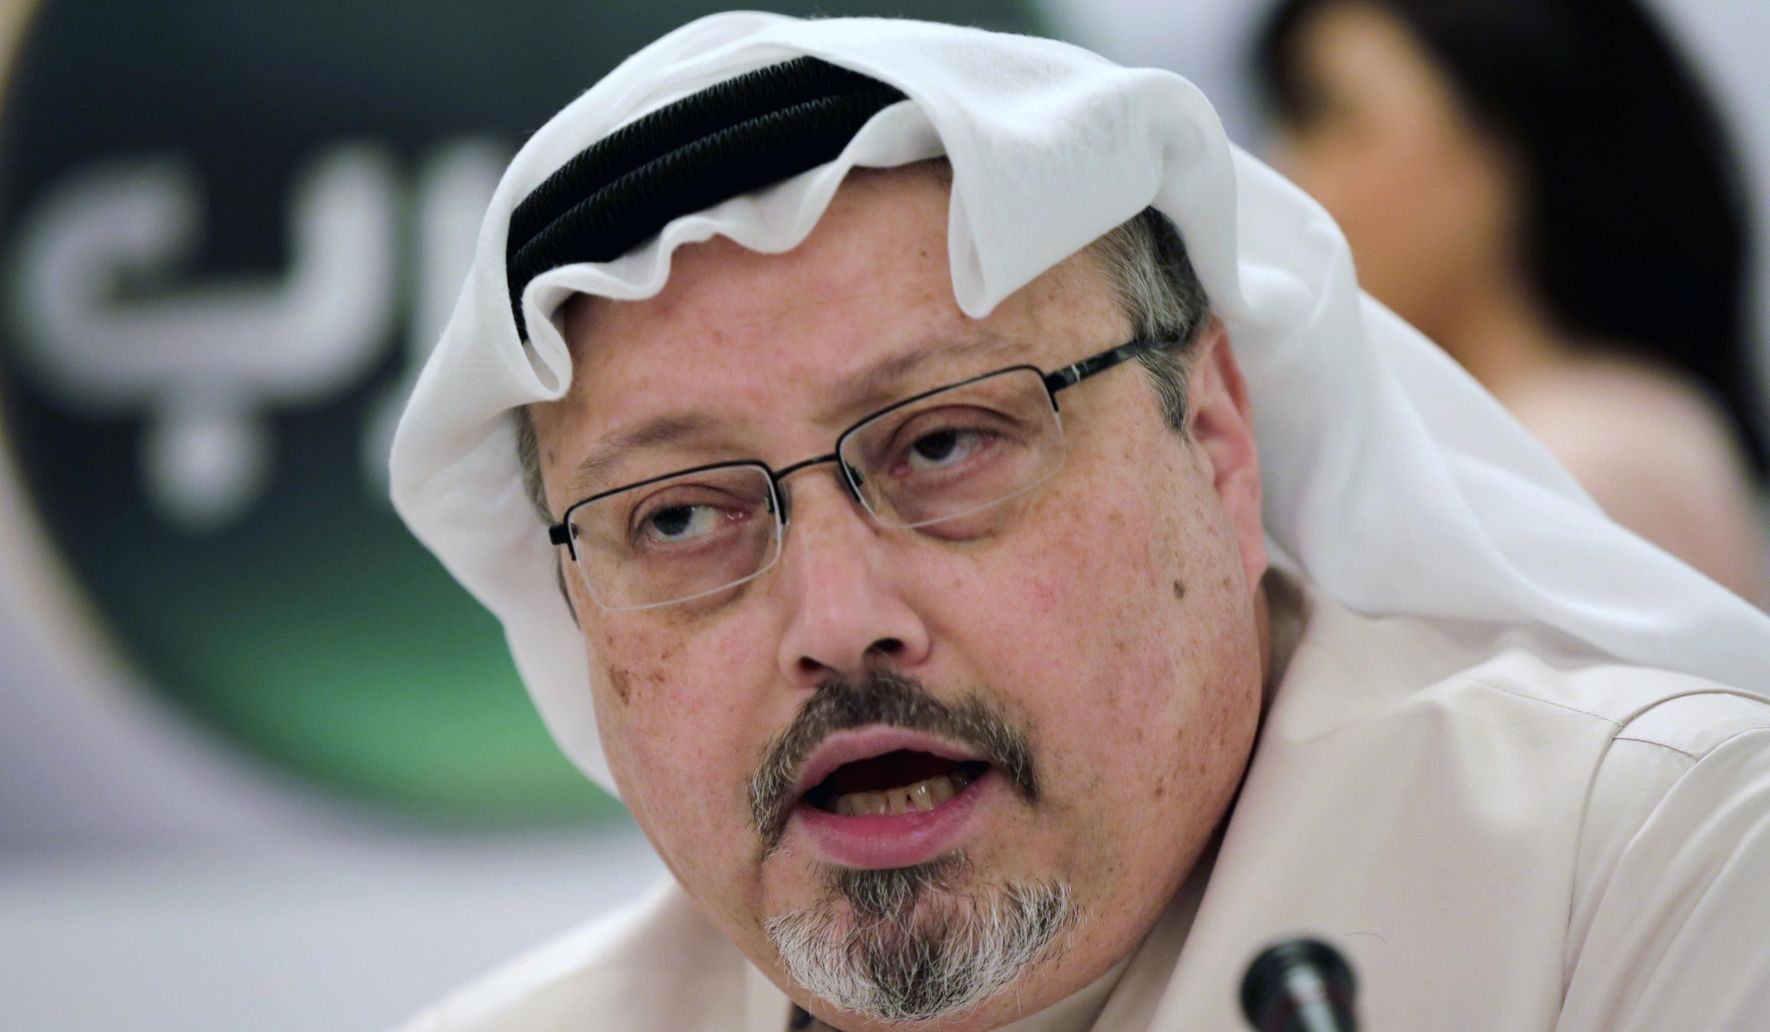 Twitter bans Saud al-Qahtani, former Saudi adviser implicated in Jamal Khashoggi murder